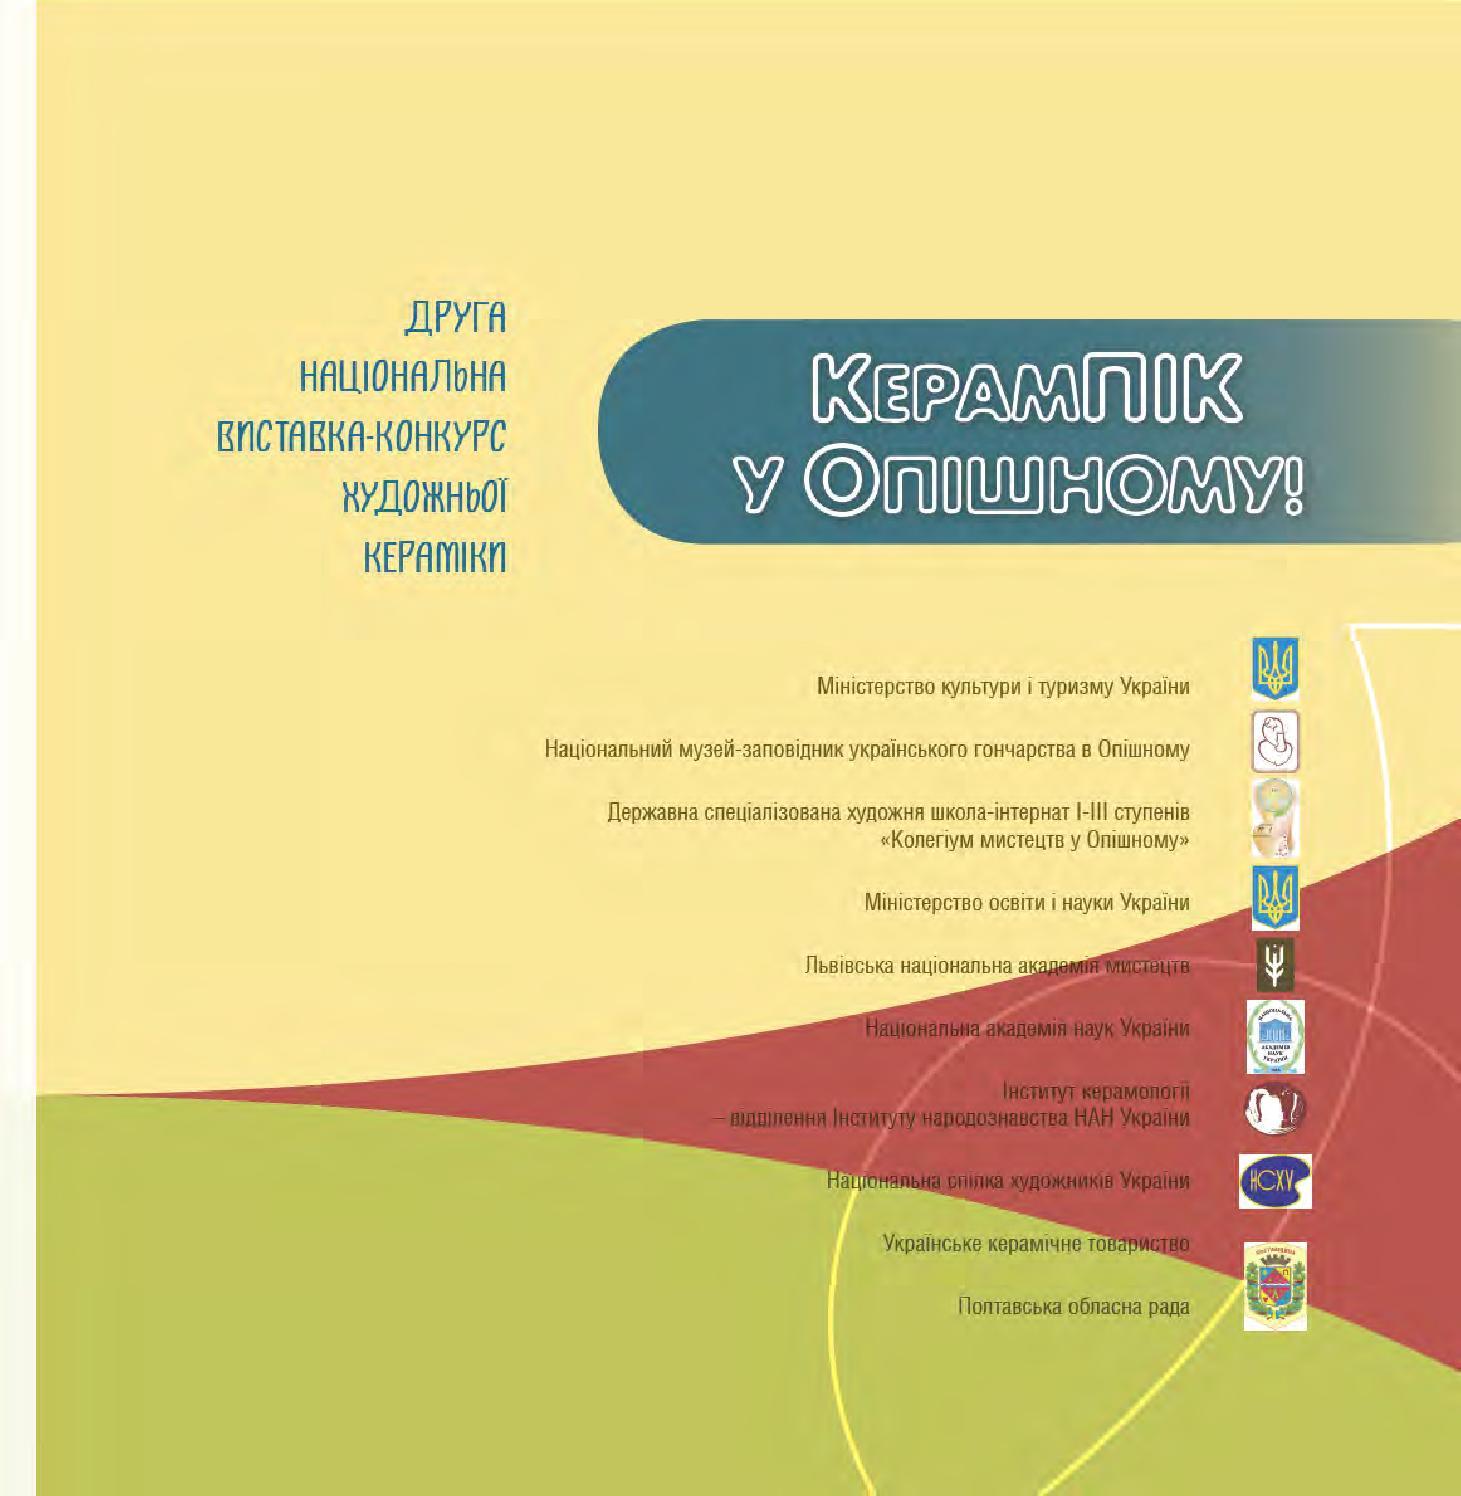 Kerampik 2010 web by Yuriy Gerasimenko - issuu 7cfcb87145297